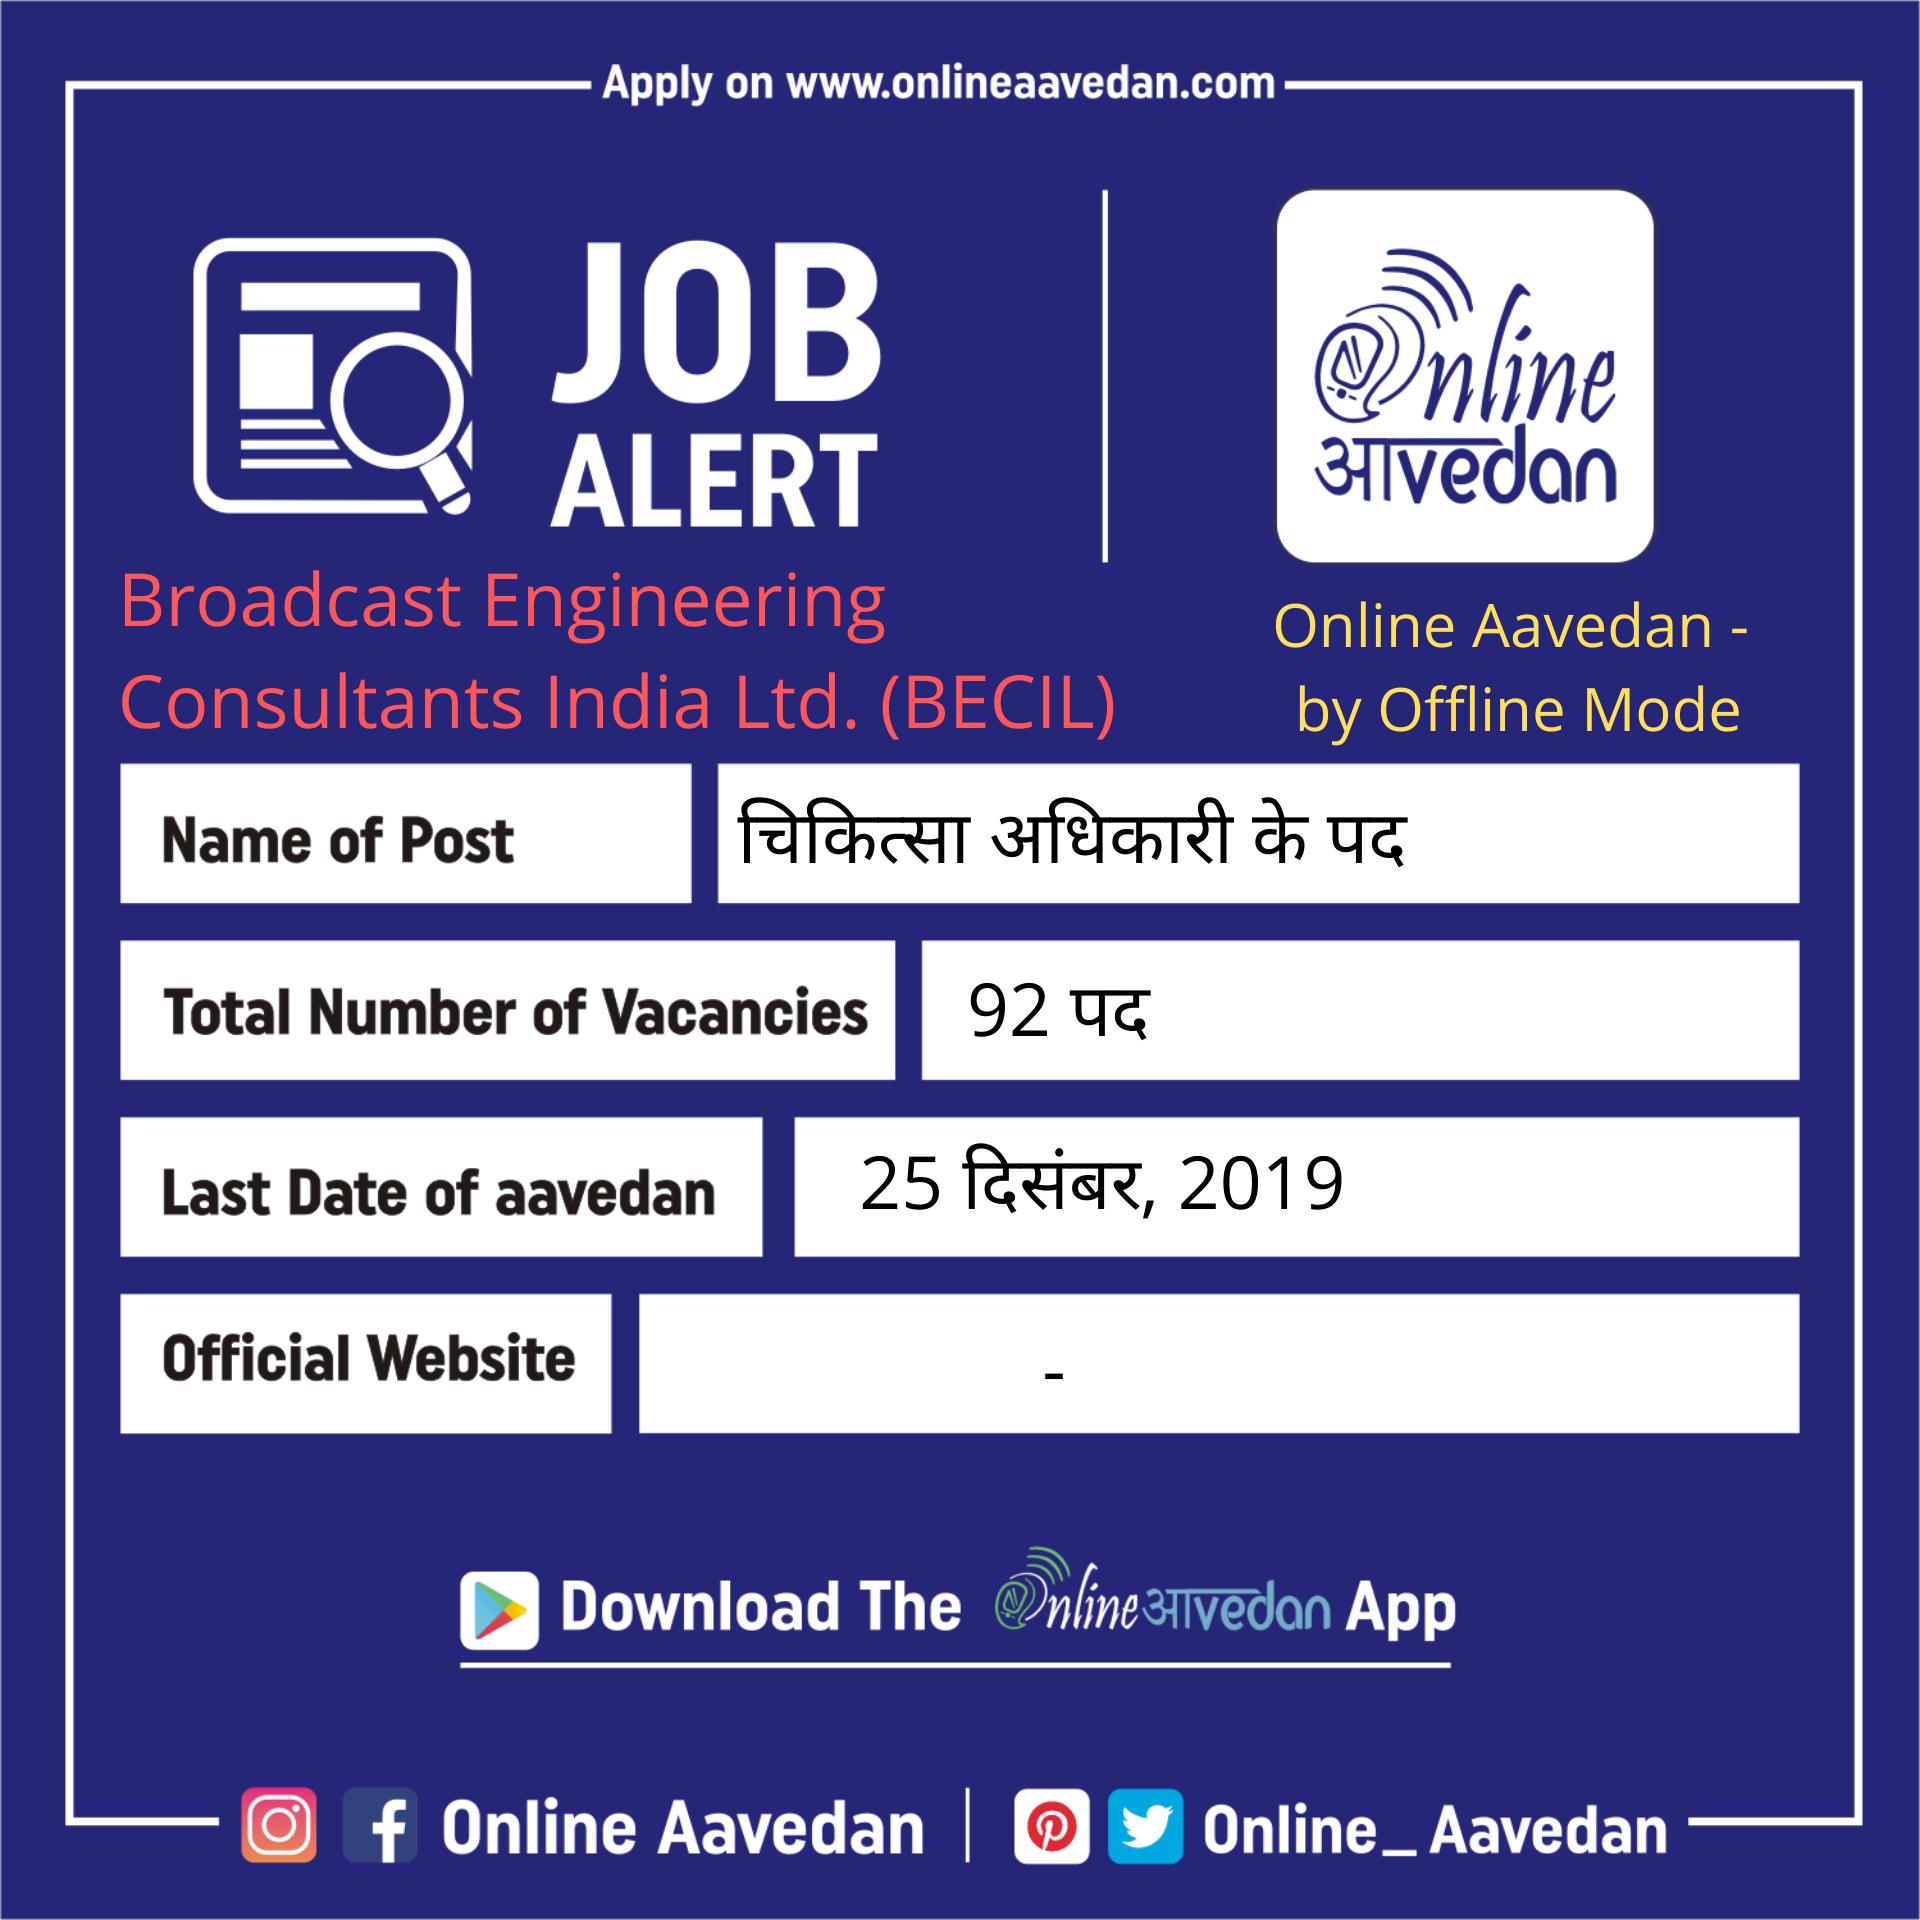 Broadcast Engineering Consultants India Ltd Becil Onlineaavedan Sarkarinaukri Govtjobs Psujobs Latestjobs Late Government Jobs Medical Jobs Police Jobs